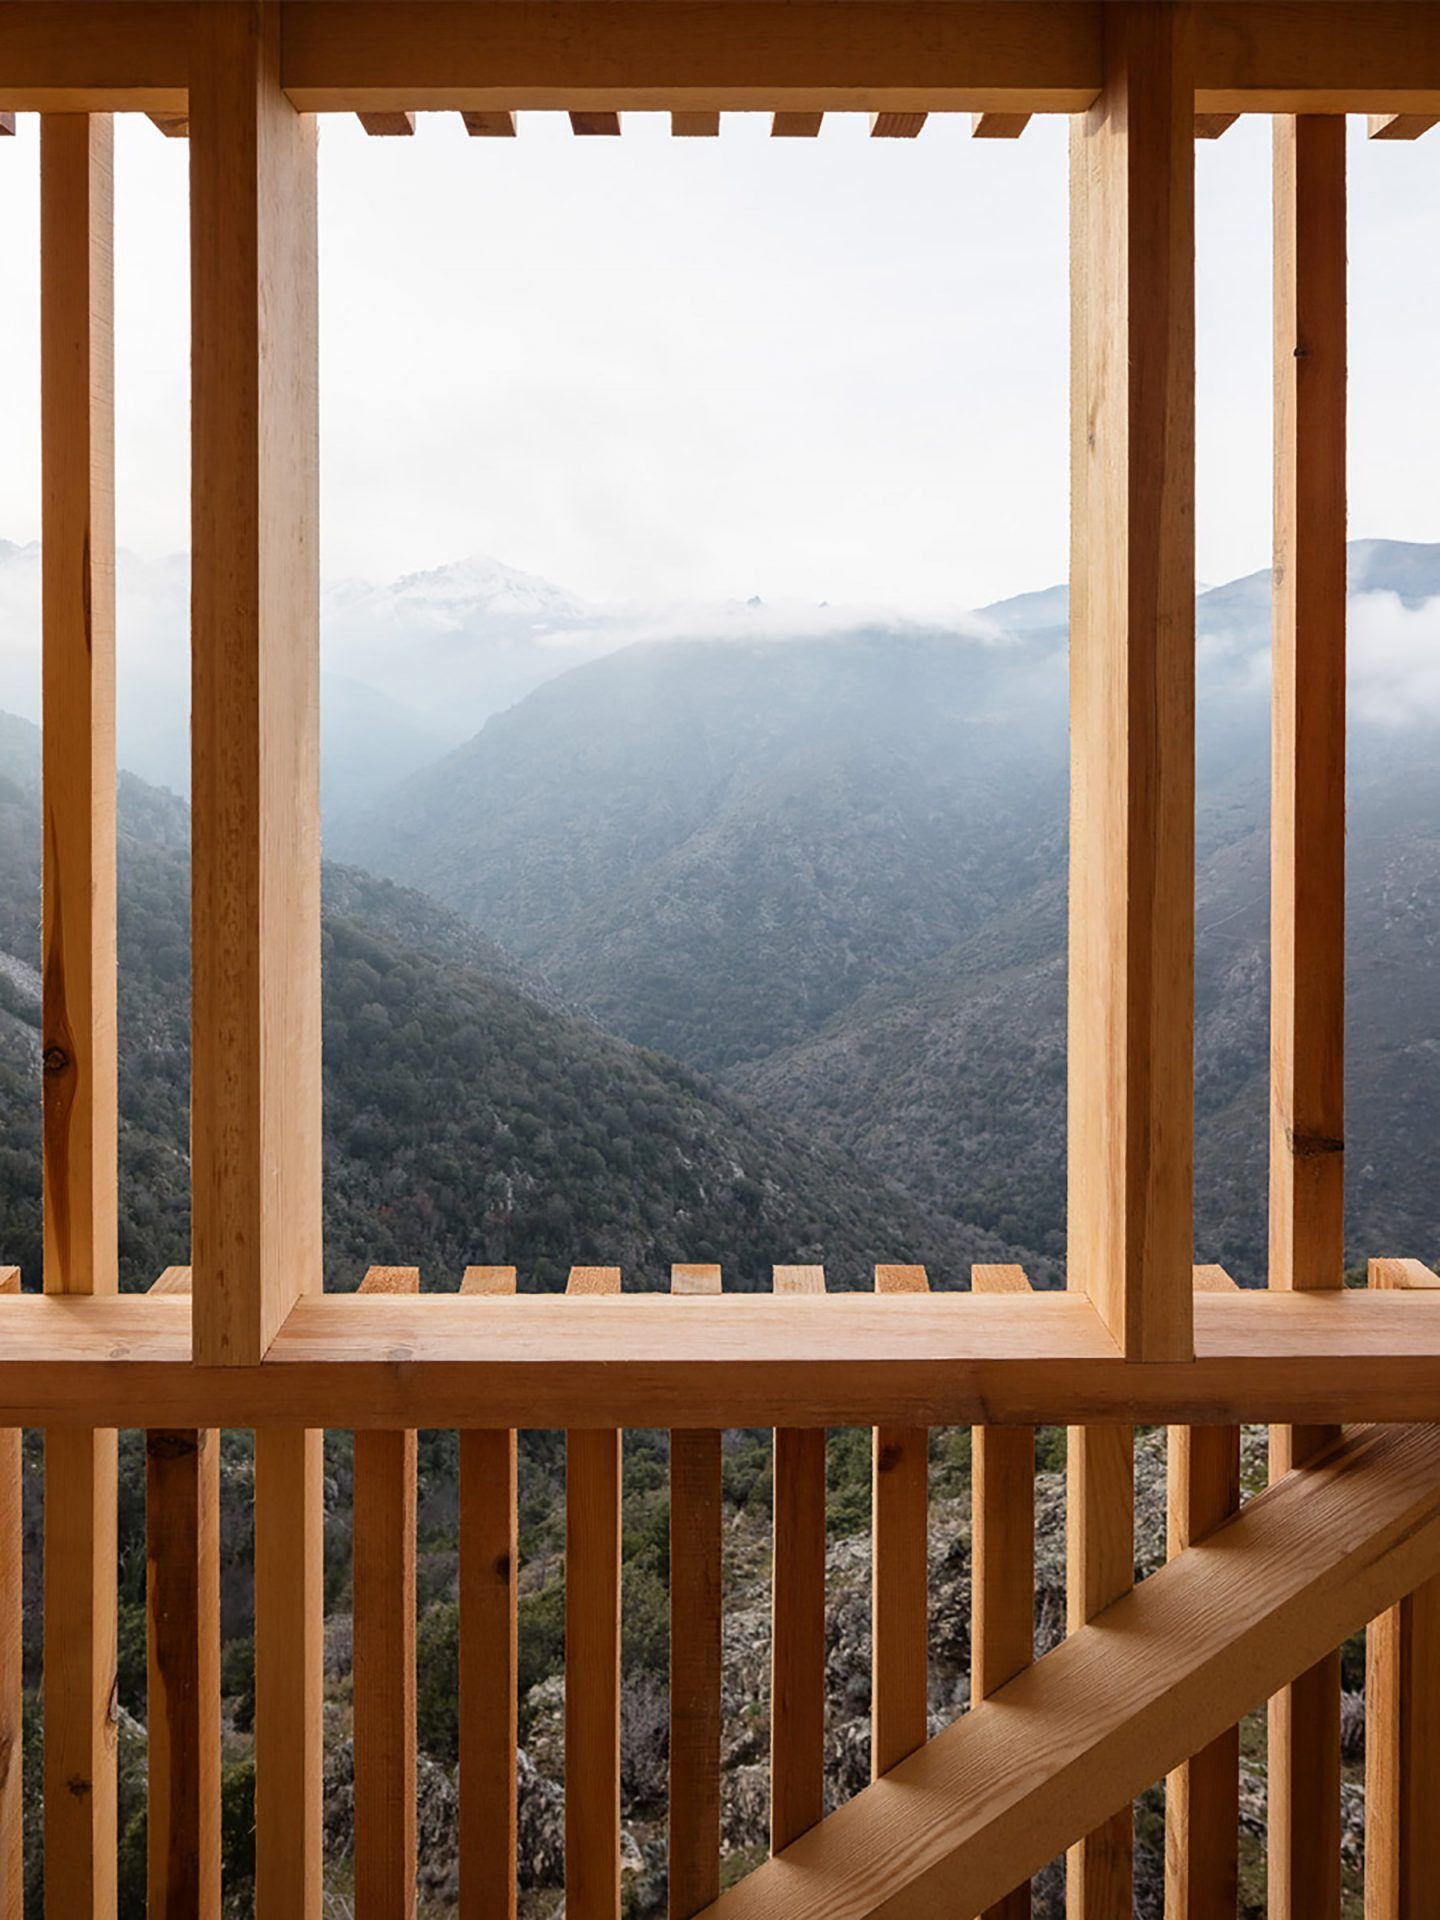 IGNANT-Architecture-Orma-Observatoire-Du-Cerf-Corse-2